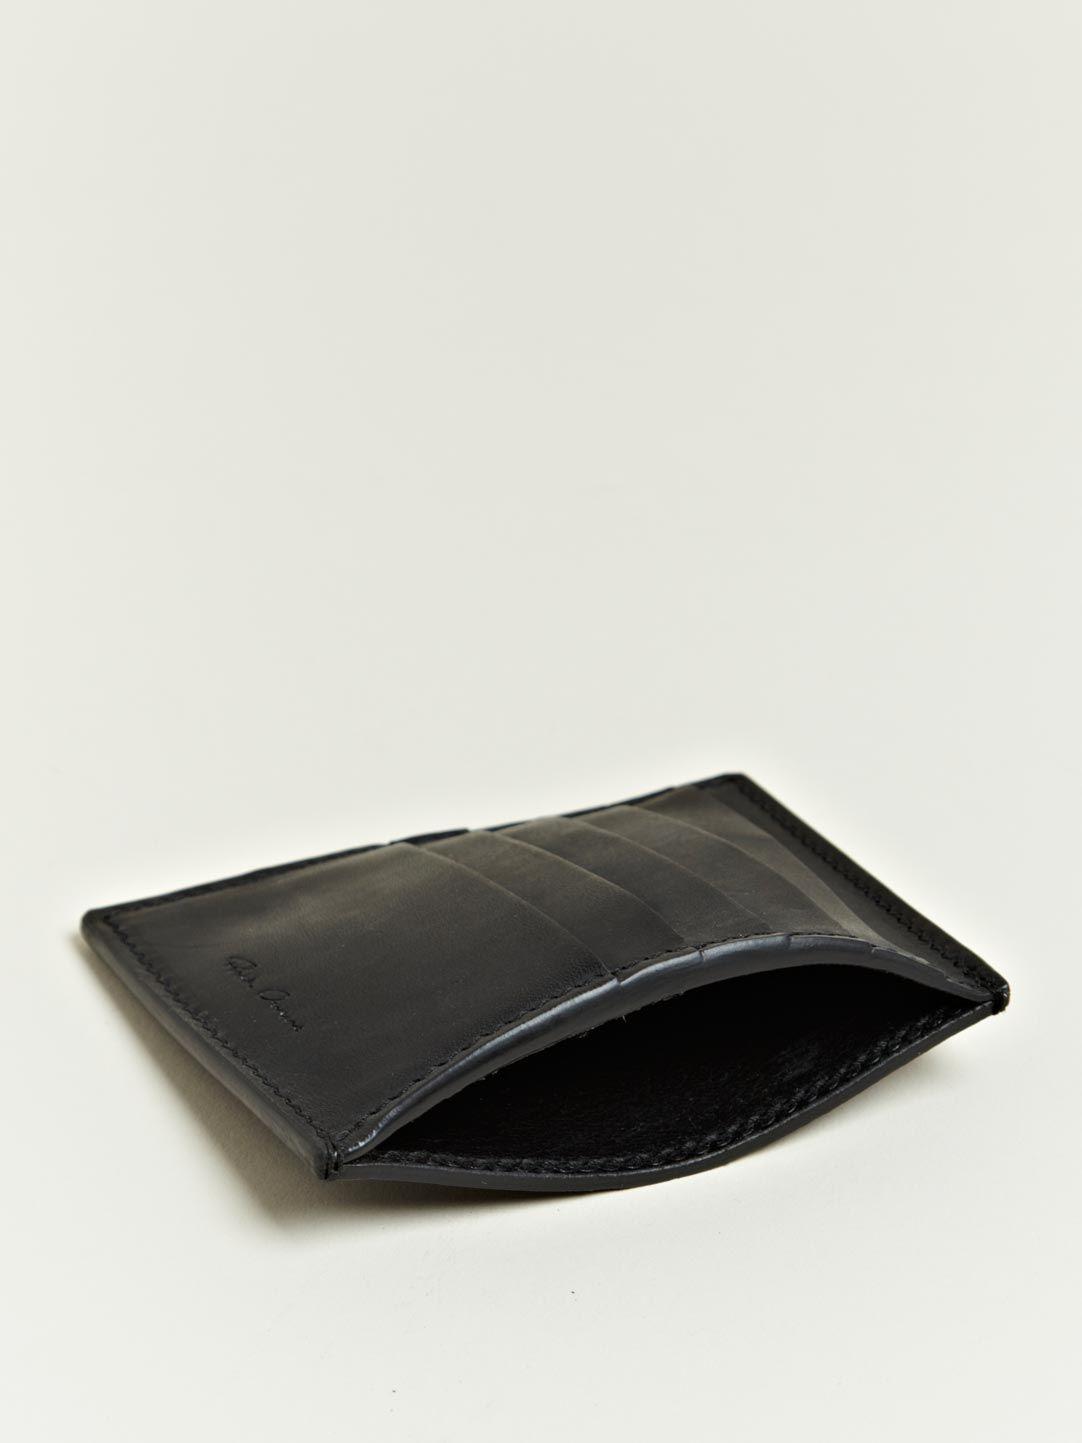 b4a6e8e5e7 Rick Owens Men's Credit Card Holder | LN-CC | bag | Rick owens men ...